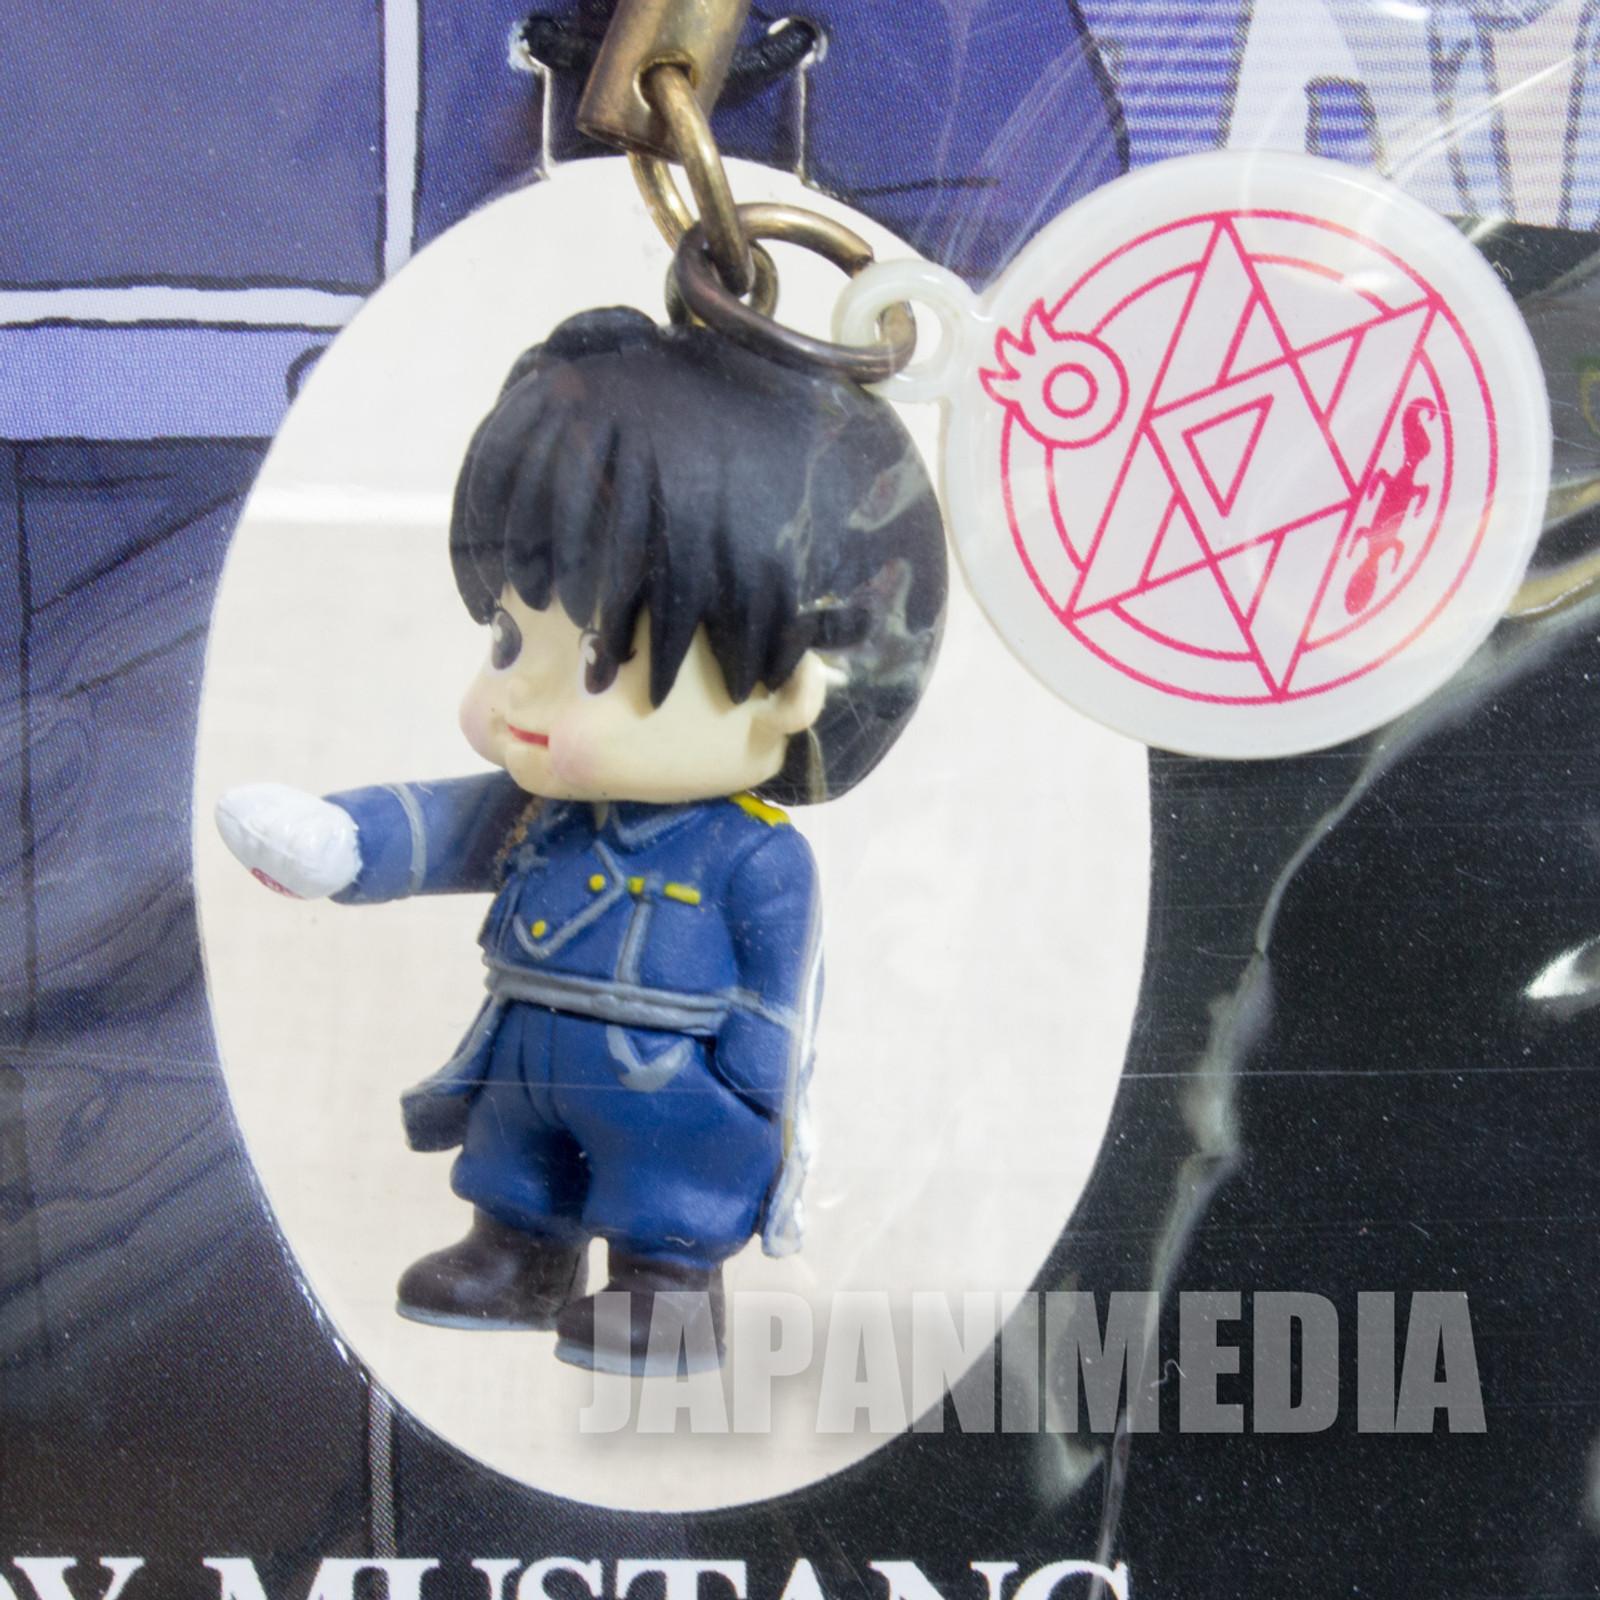 FullMetal Alchemist Roy Mustang Rose O'neill Kewpie Kewsion Strap JAPAN ANIME